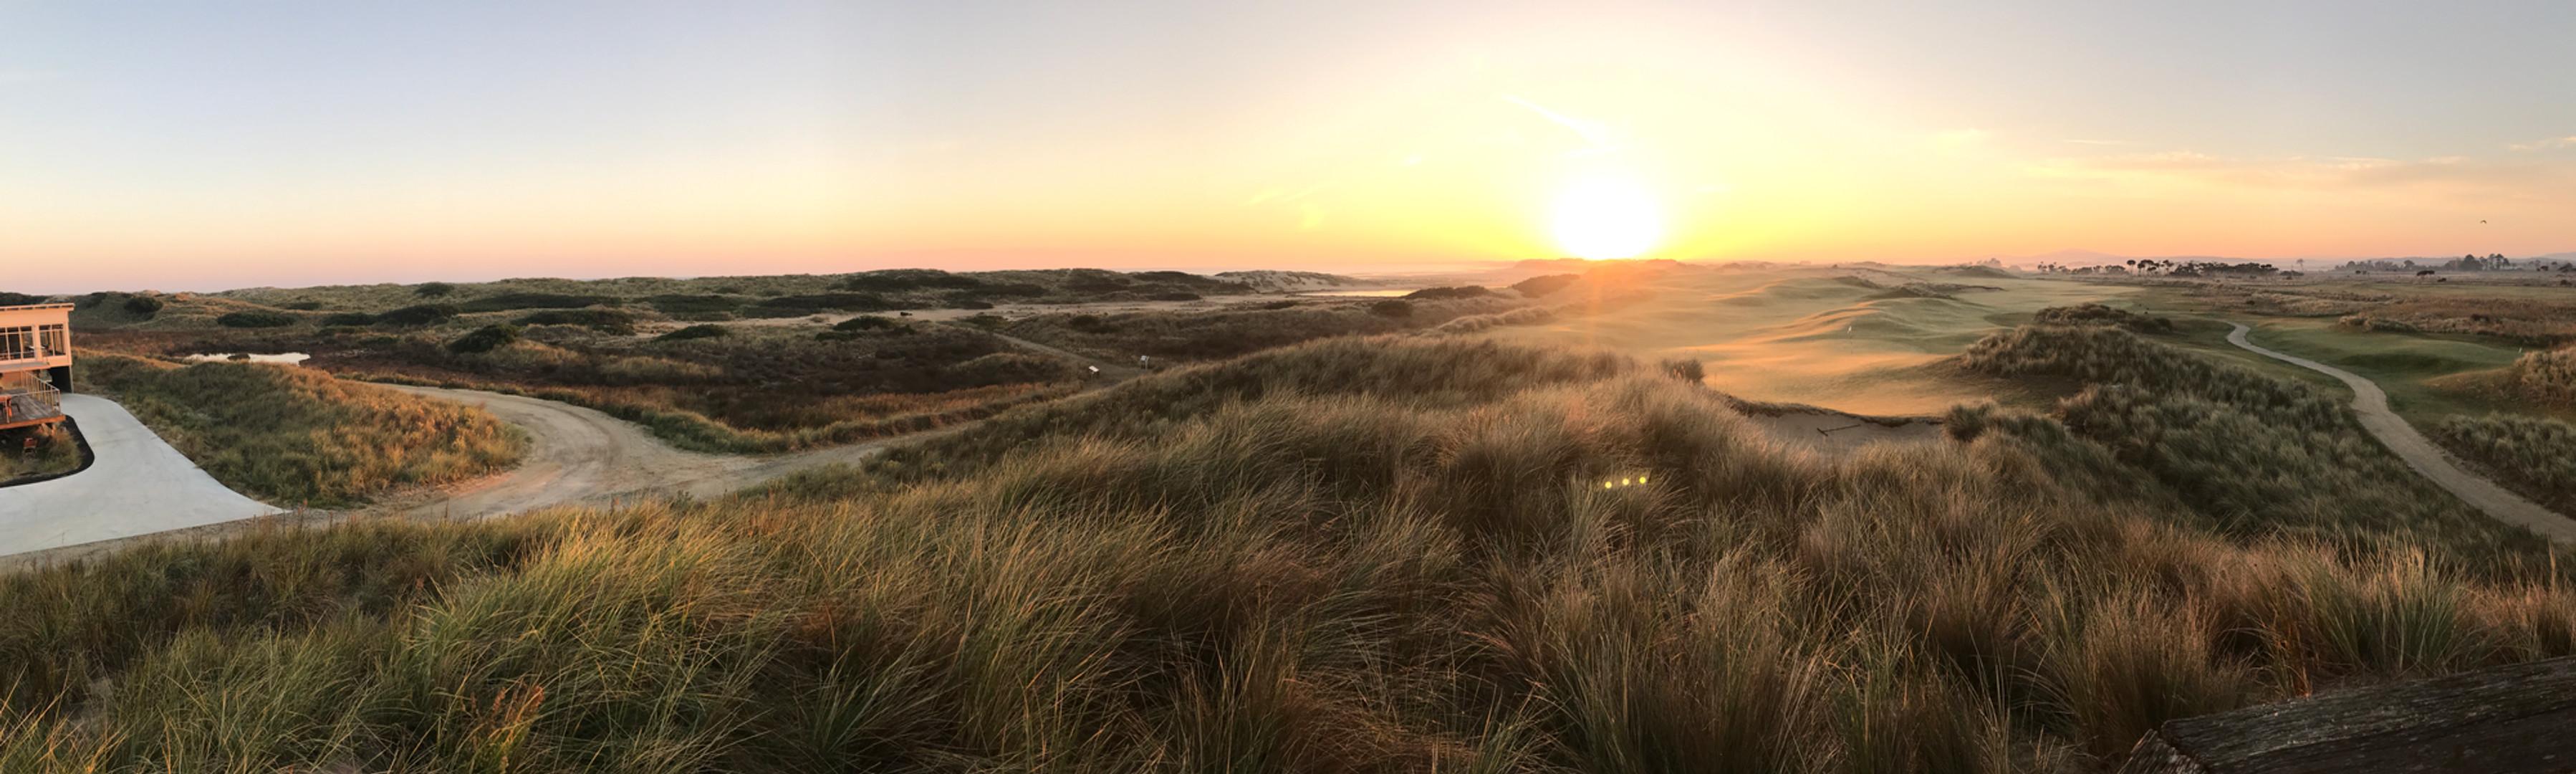 Barnbougle Dunes, Australia